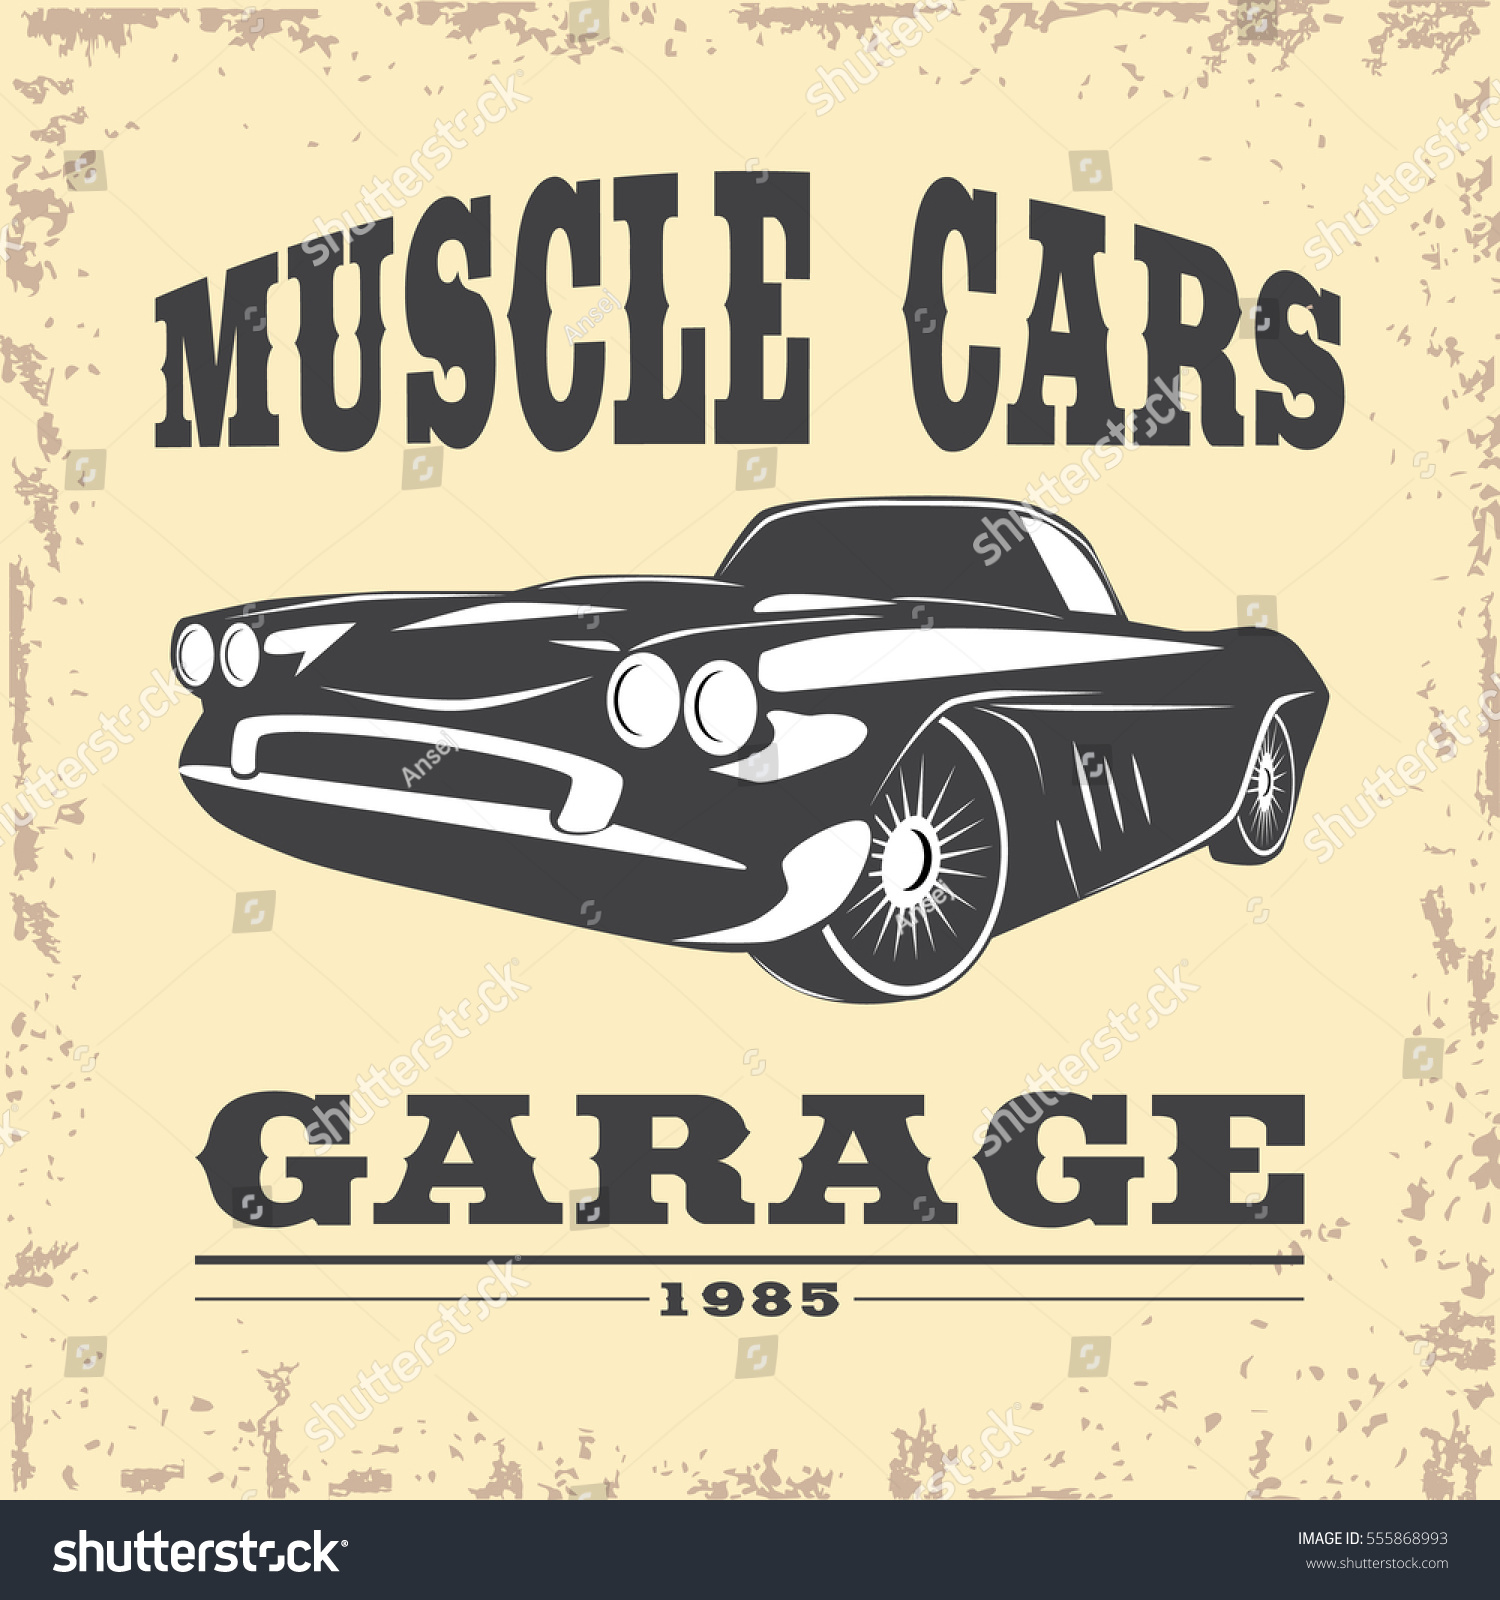 Vintage Muscle Car Garage Poster Vector Stock Vector 555868993 ...